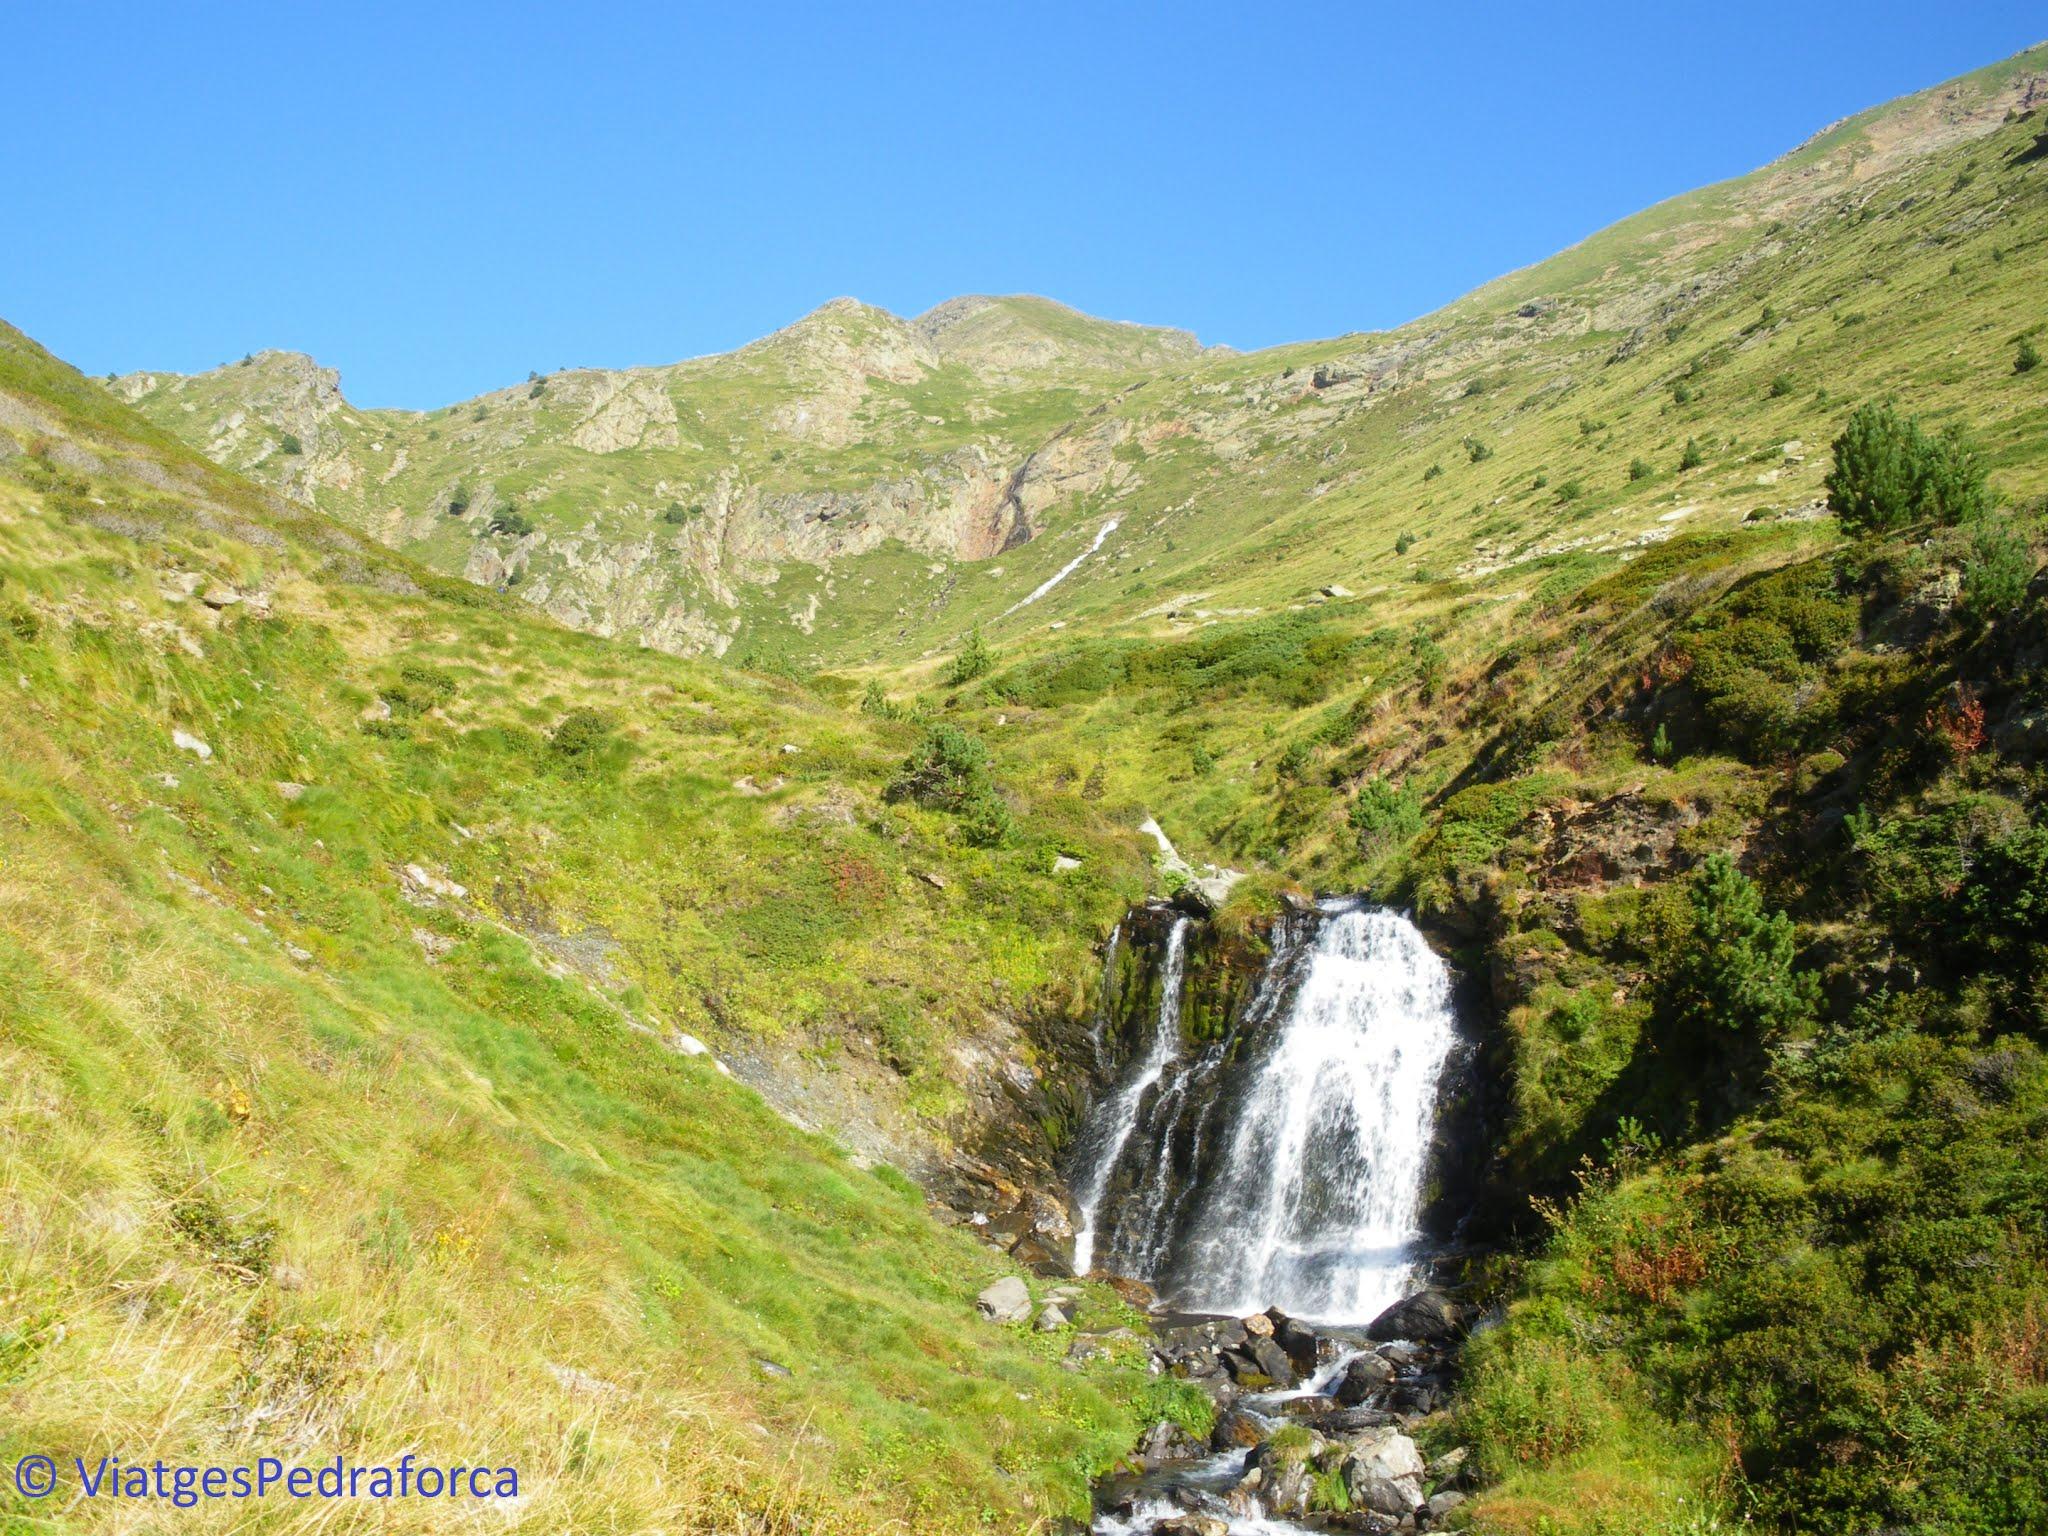 Les millors rutes senderistes per Andorra, senderisme, trekking, pirineus